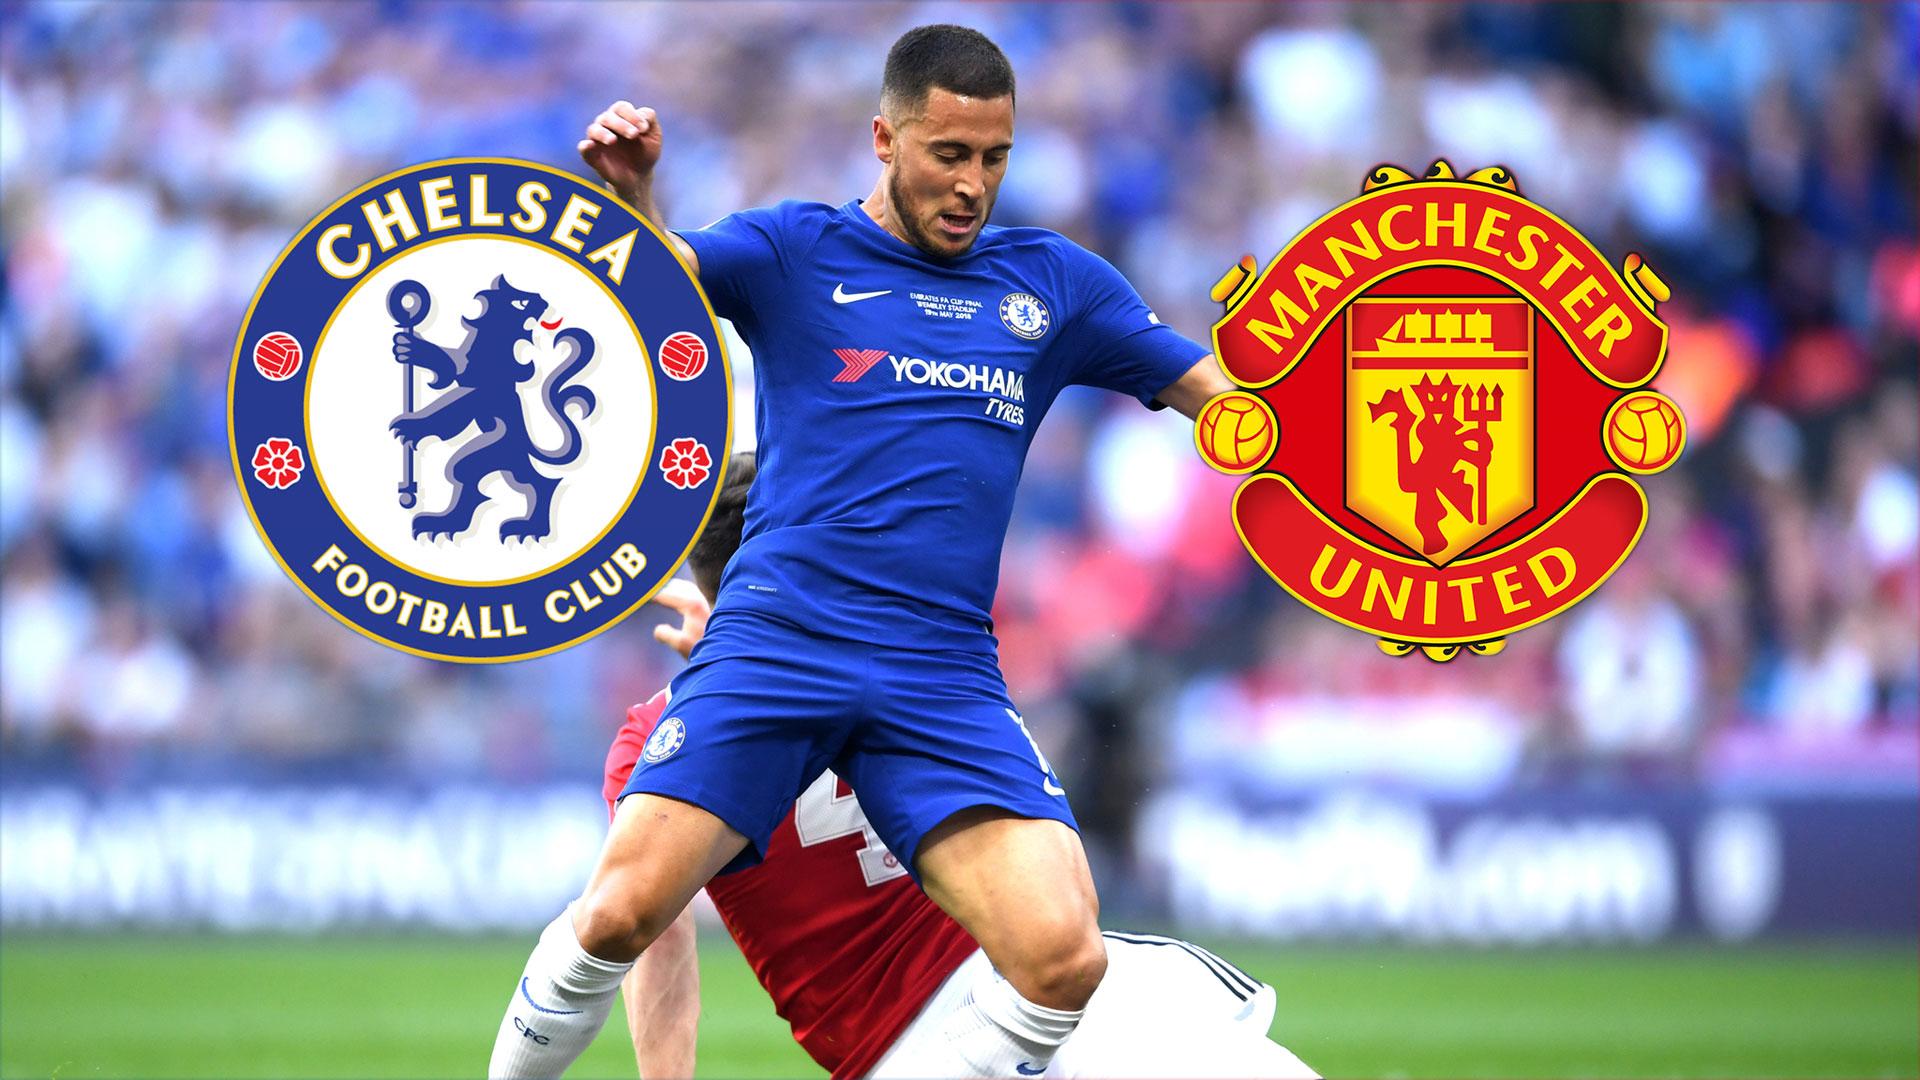 Chelsea Manchester United TV LIVE STREAM